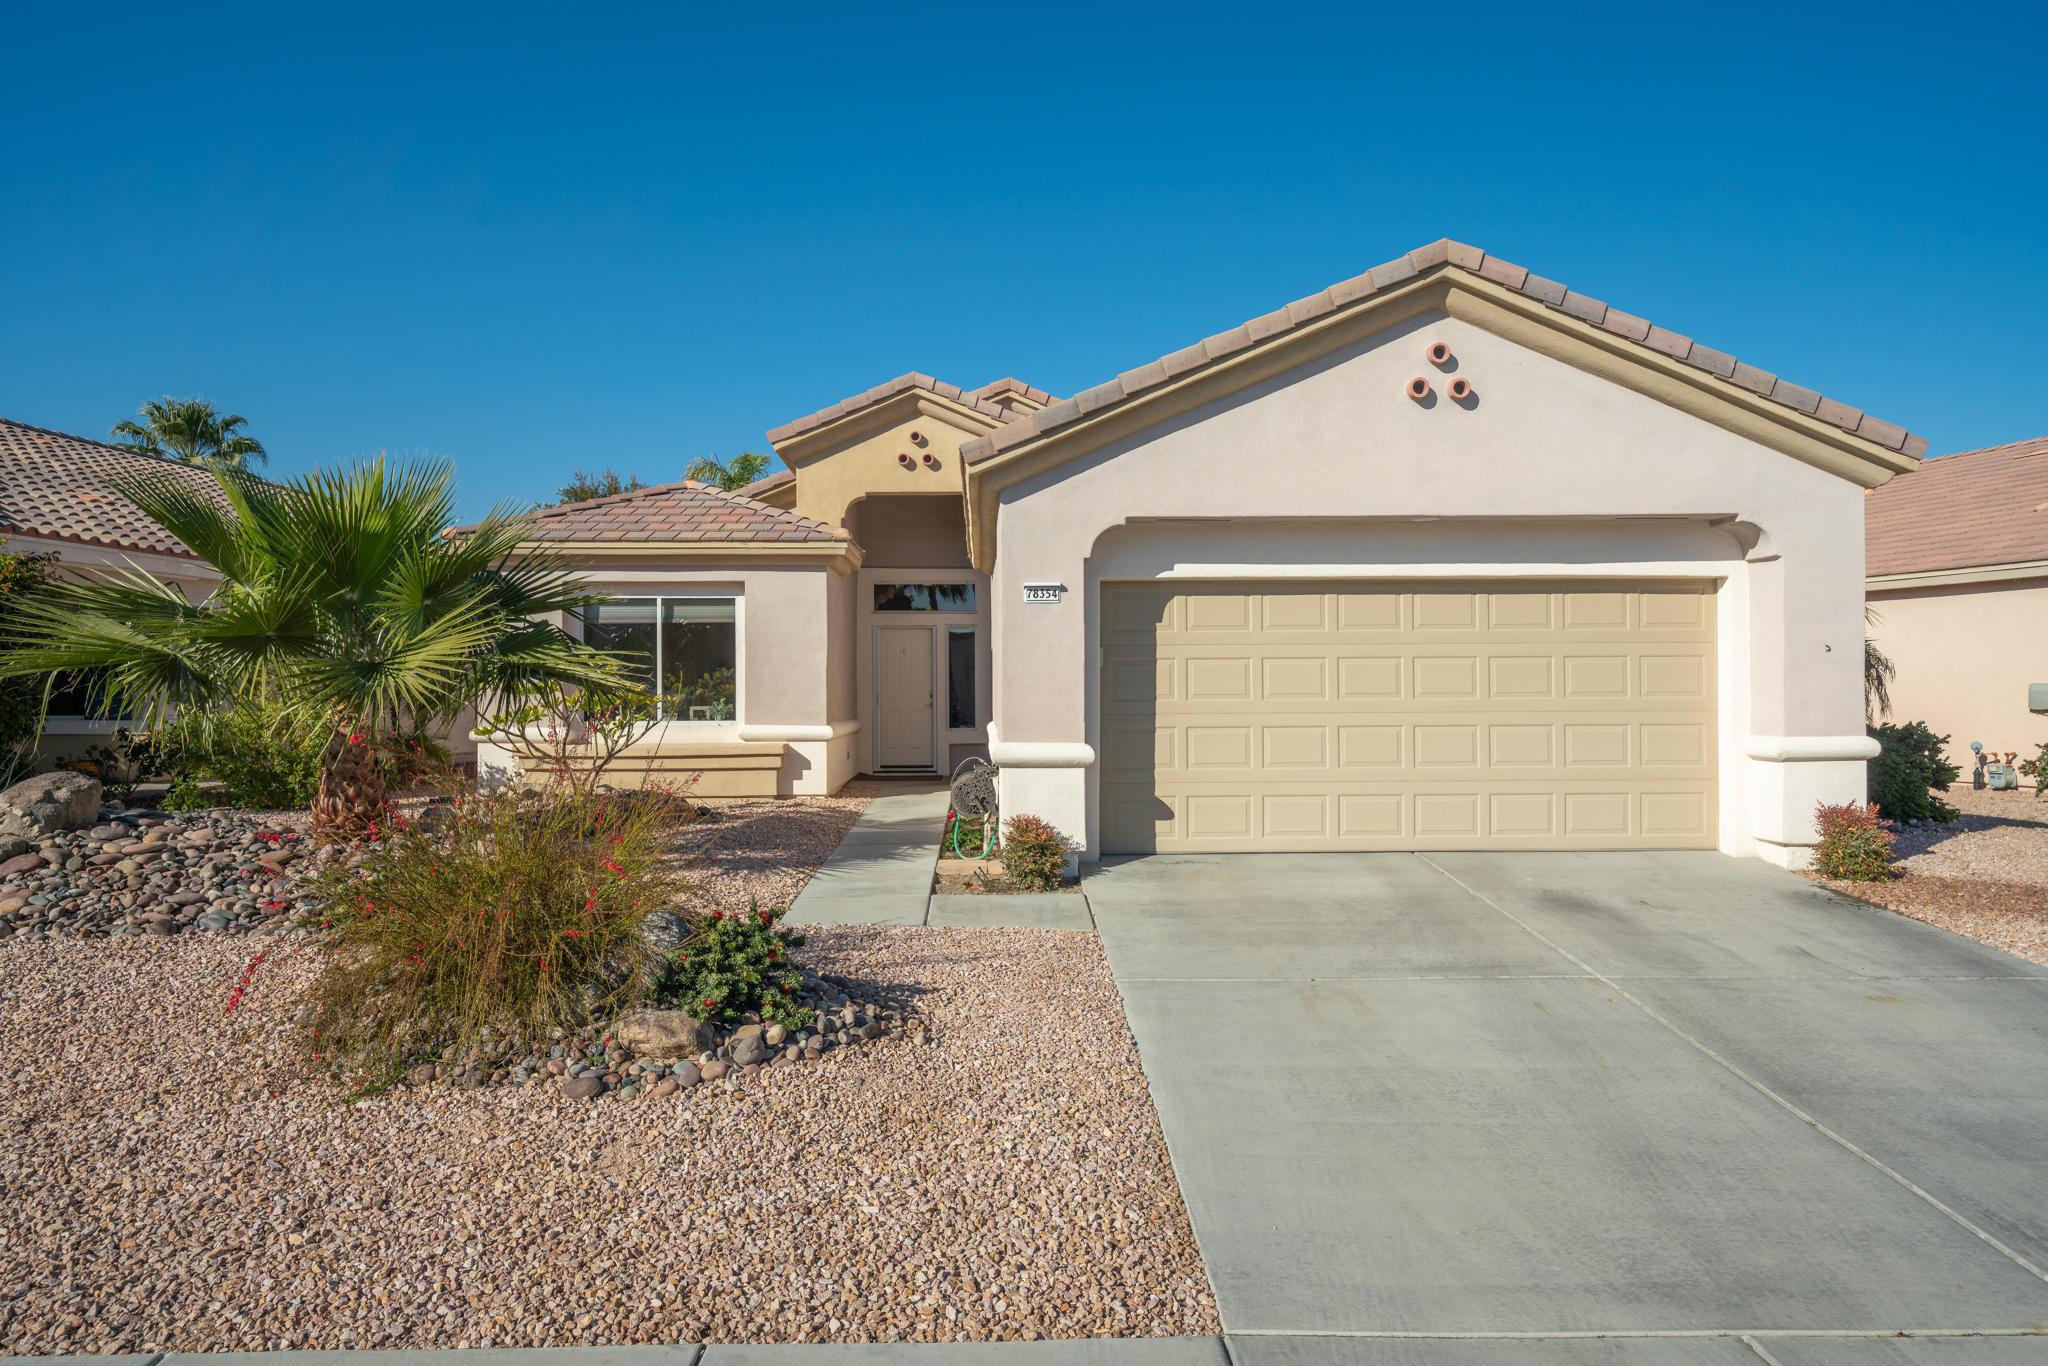 Photo of 78354 Brookhaven Lane, Palm Desert, CA 92211